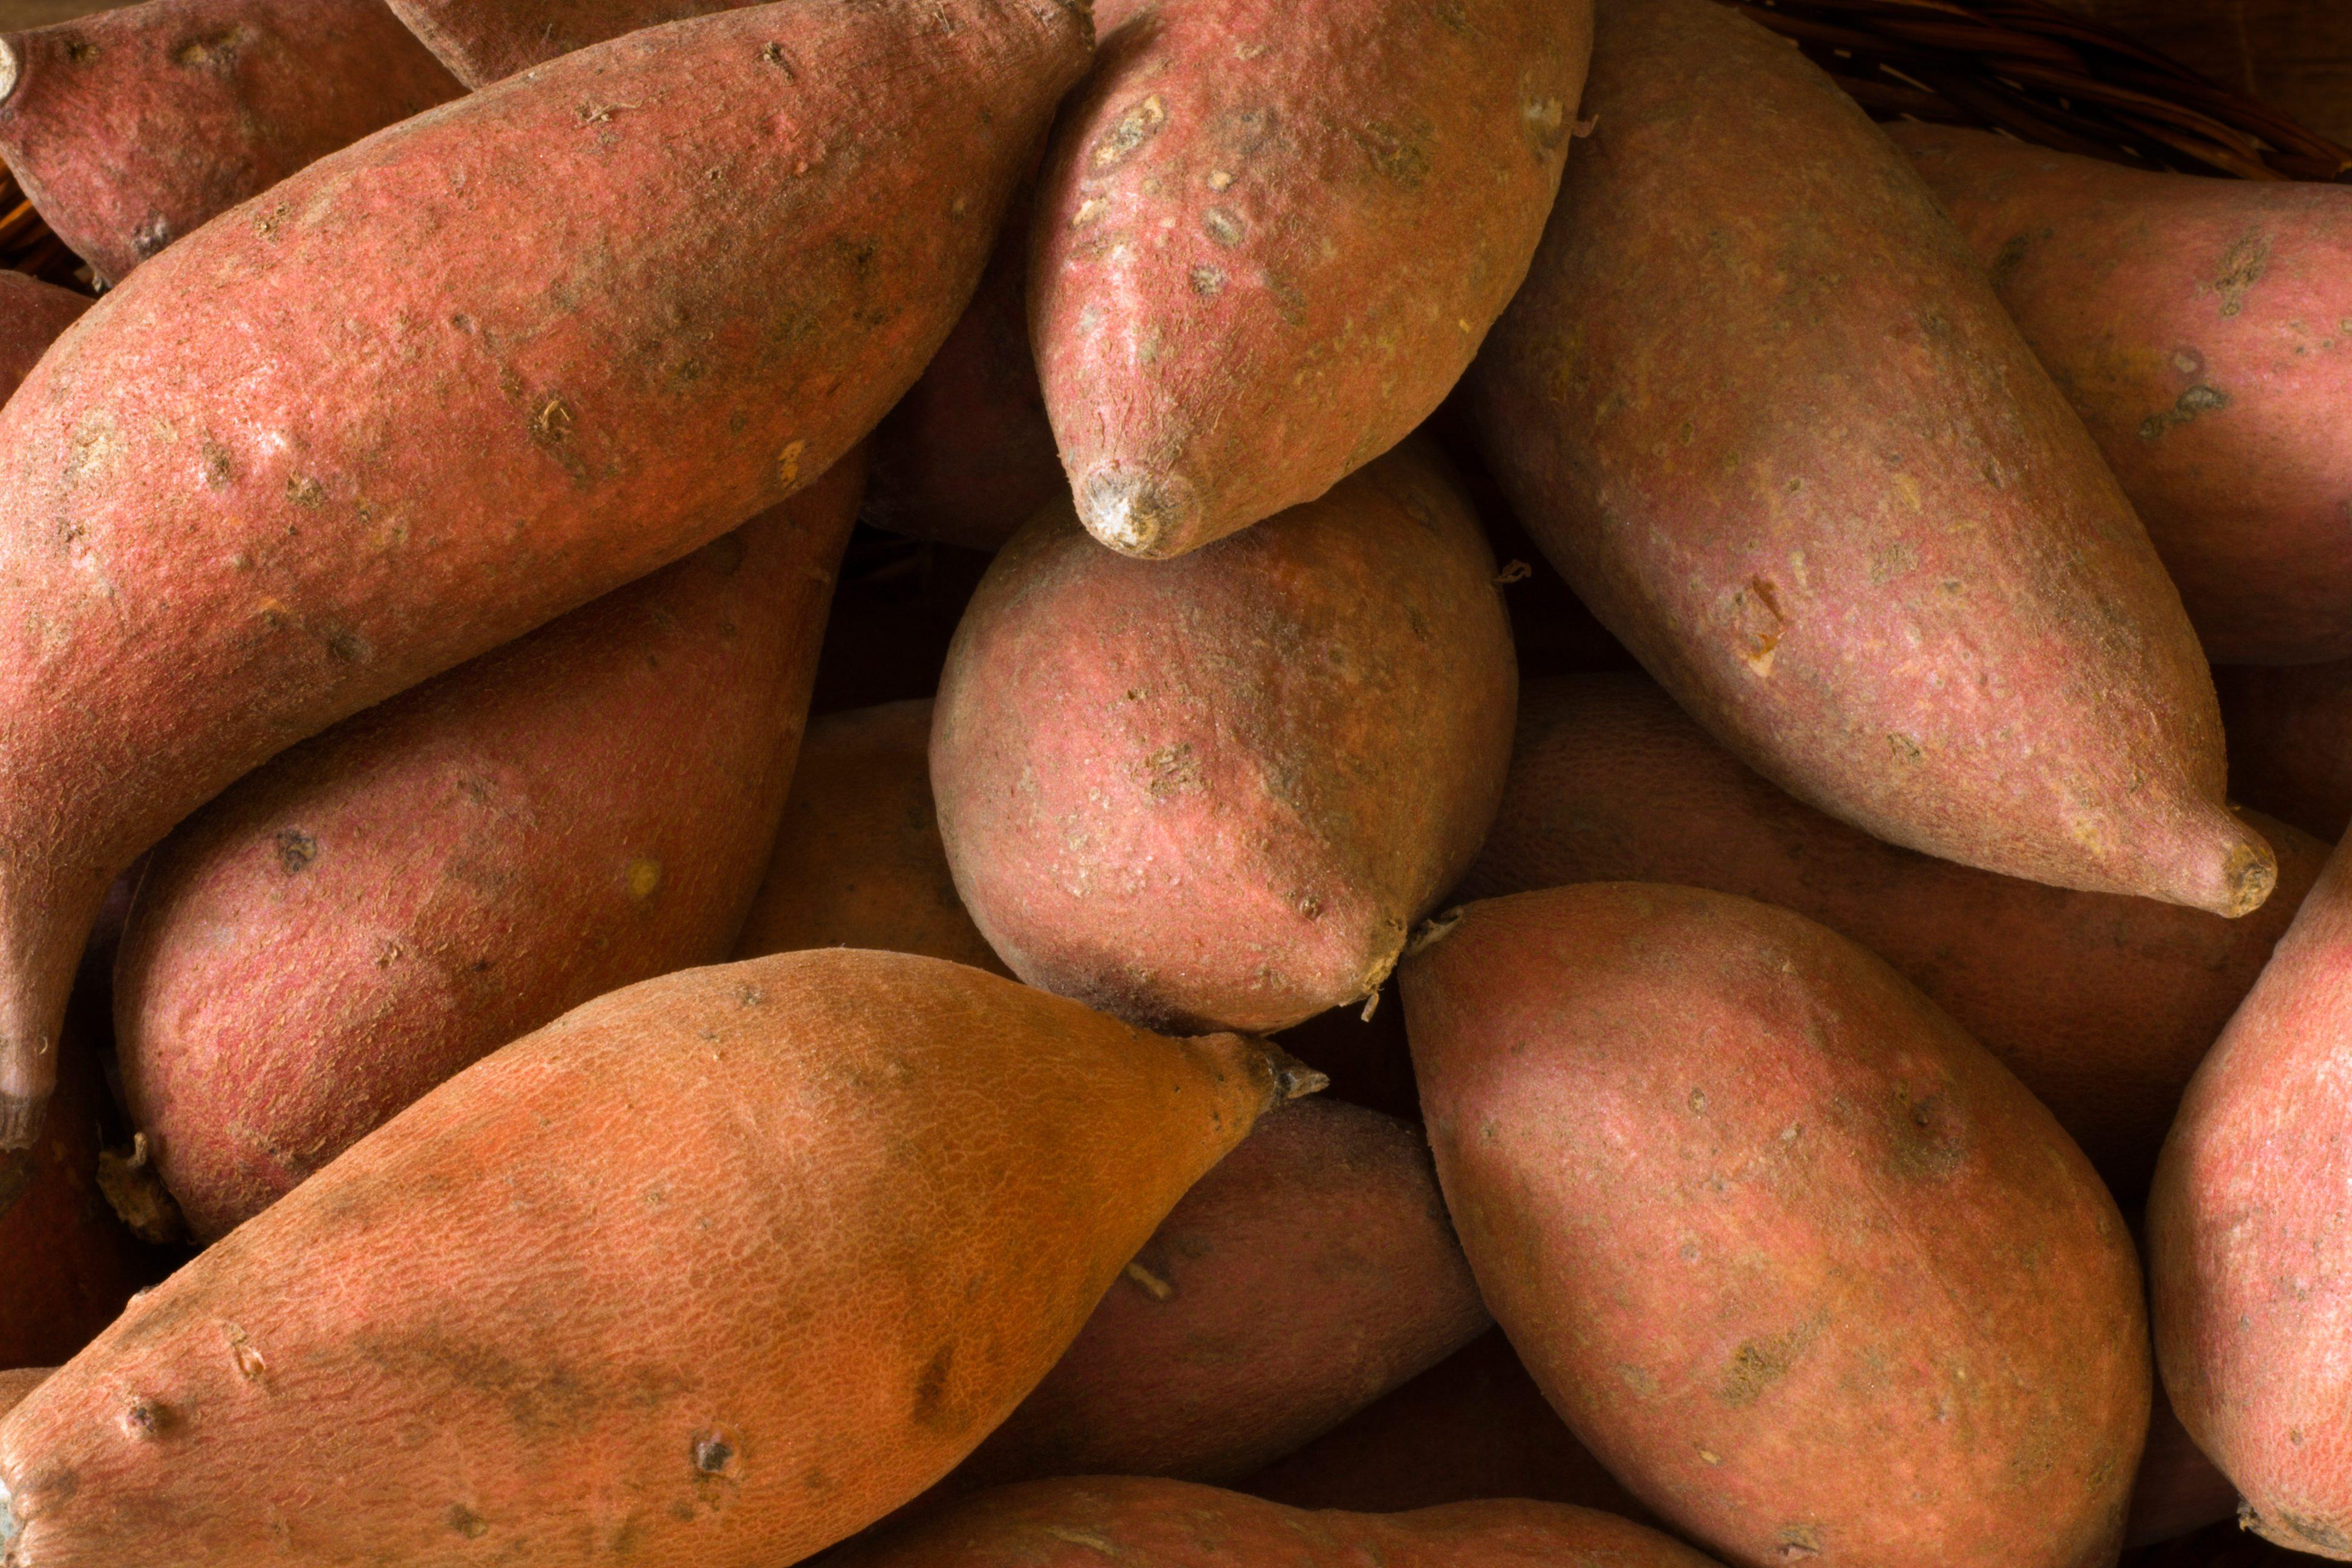 Raw Whole Sweet Potatoes Yams, Fresh Healthy Root Vegetable